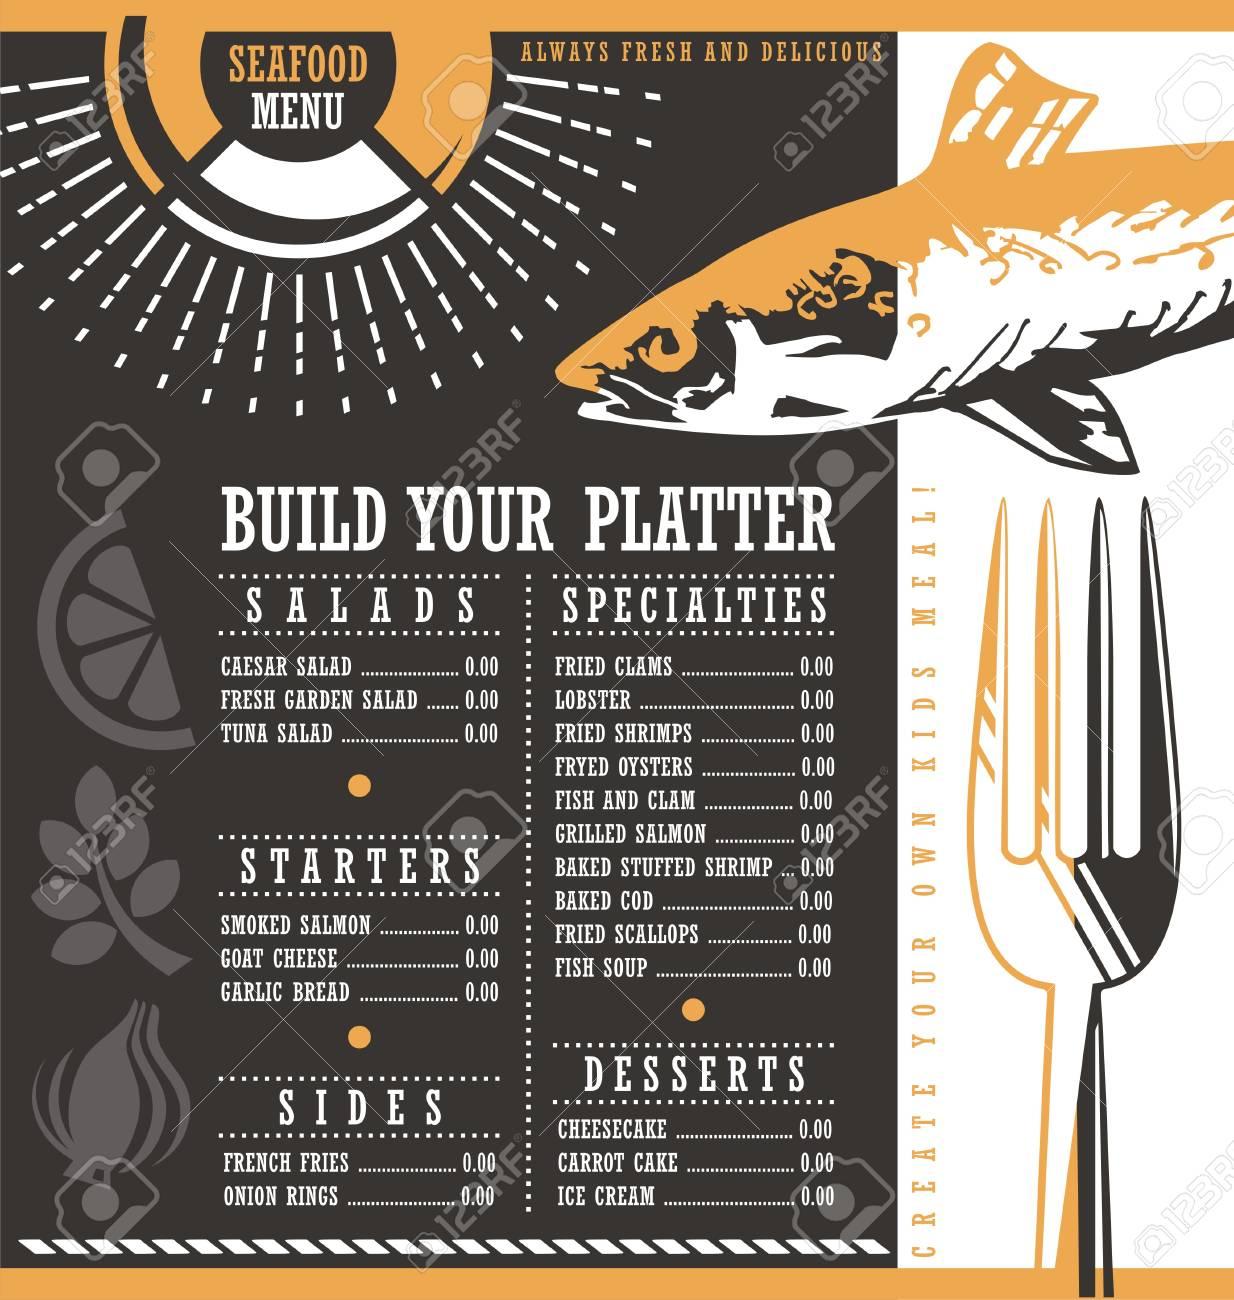 seafood restaurant menu design royalty free cliparts, vectors, and